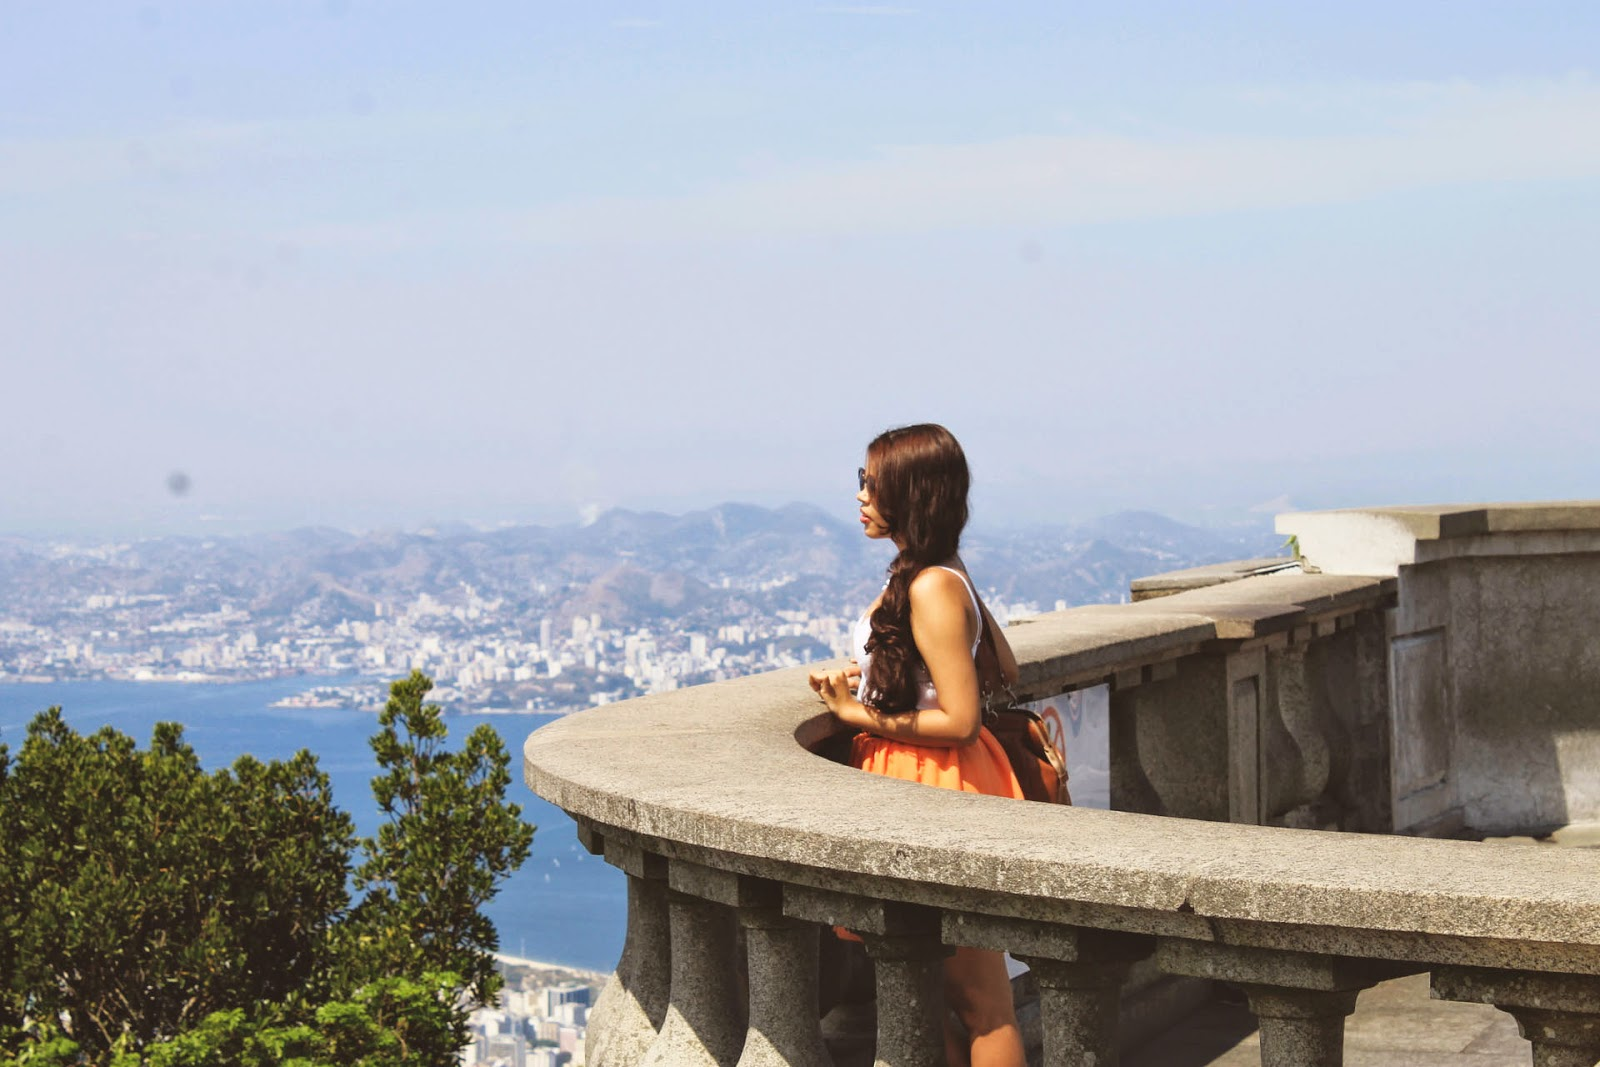 cristo redentor, corcovado, rio de janeiro, cartão-postal, lugares para visitar, lugares para visitar no Rio de Janeiro, como chegar ao Cristo redentor, quanto custa comida no corcovado, fotos no corcovado